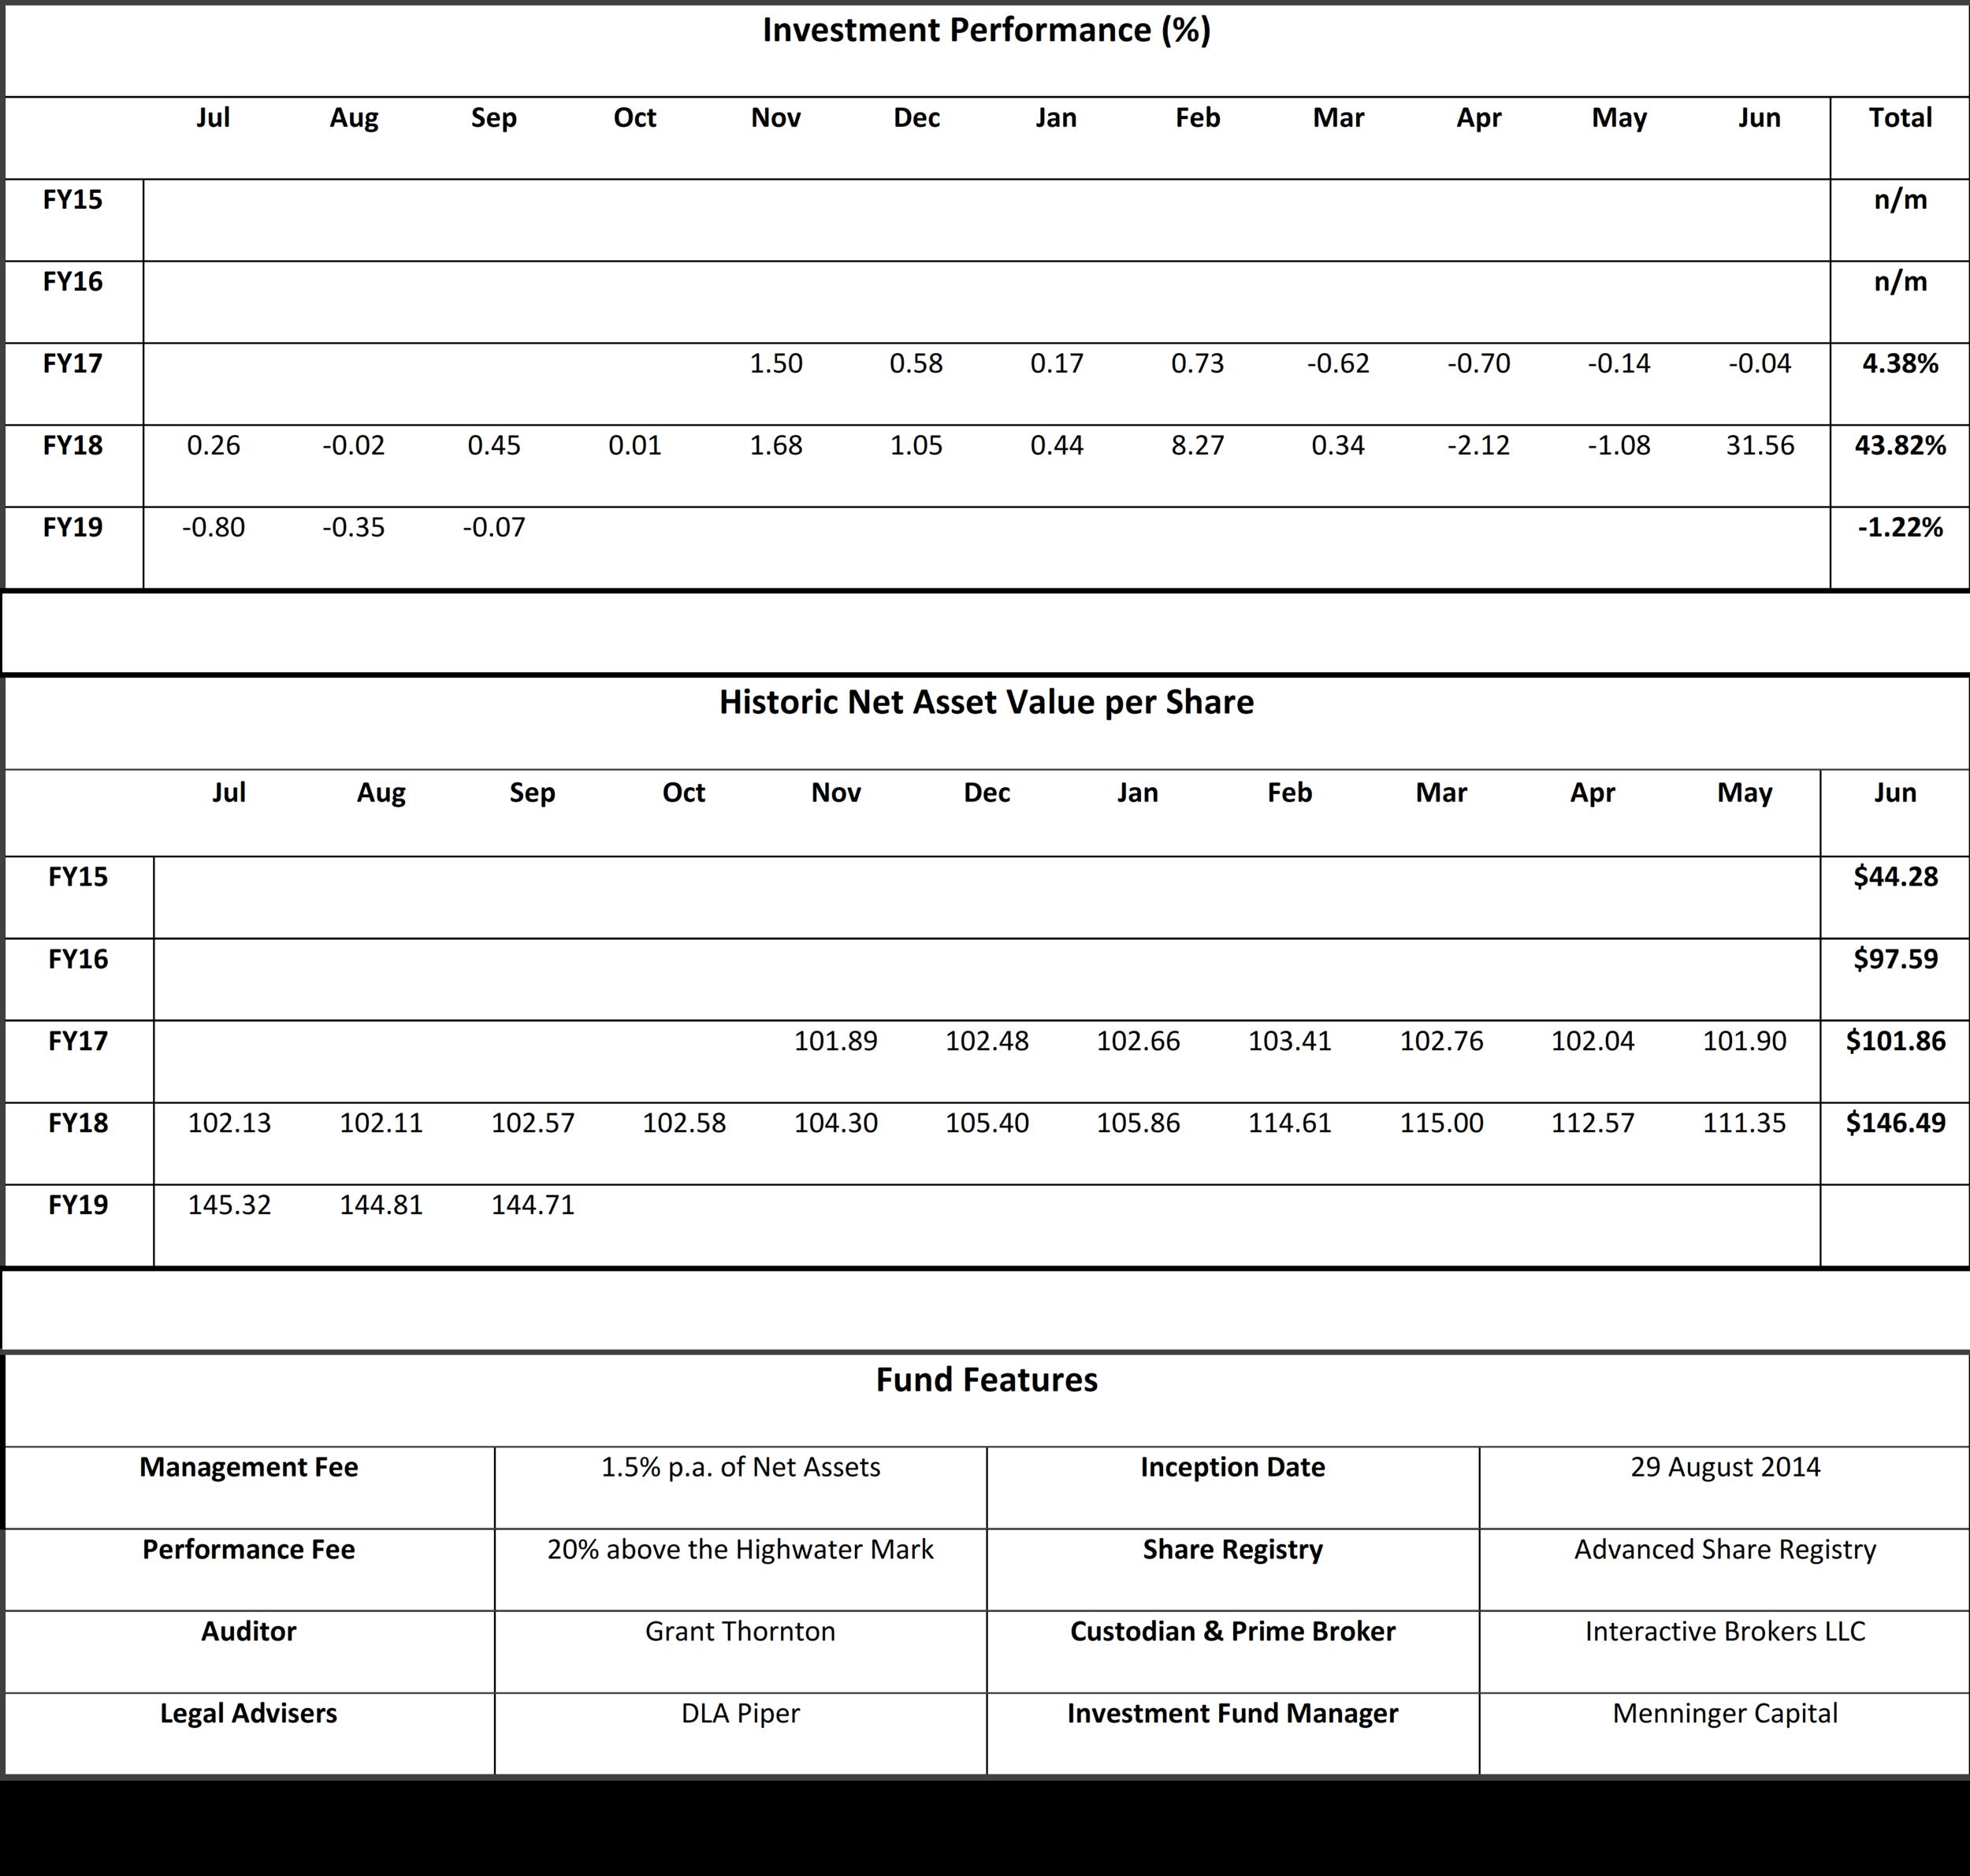 20180930 - Marathon Performance Table Sep 2018.png